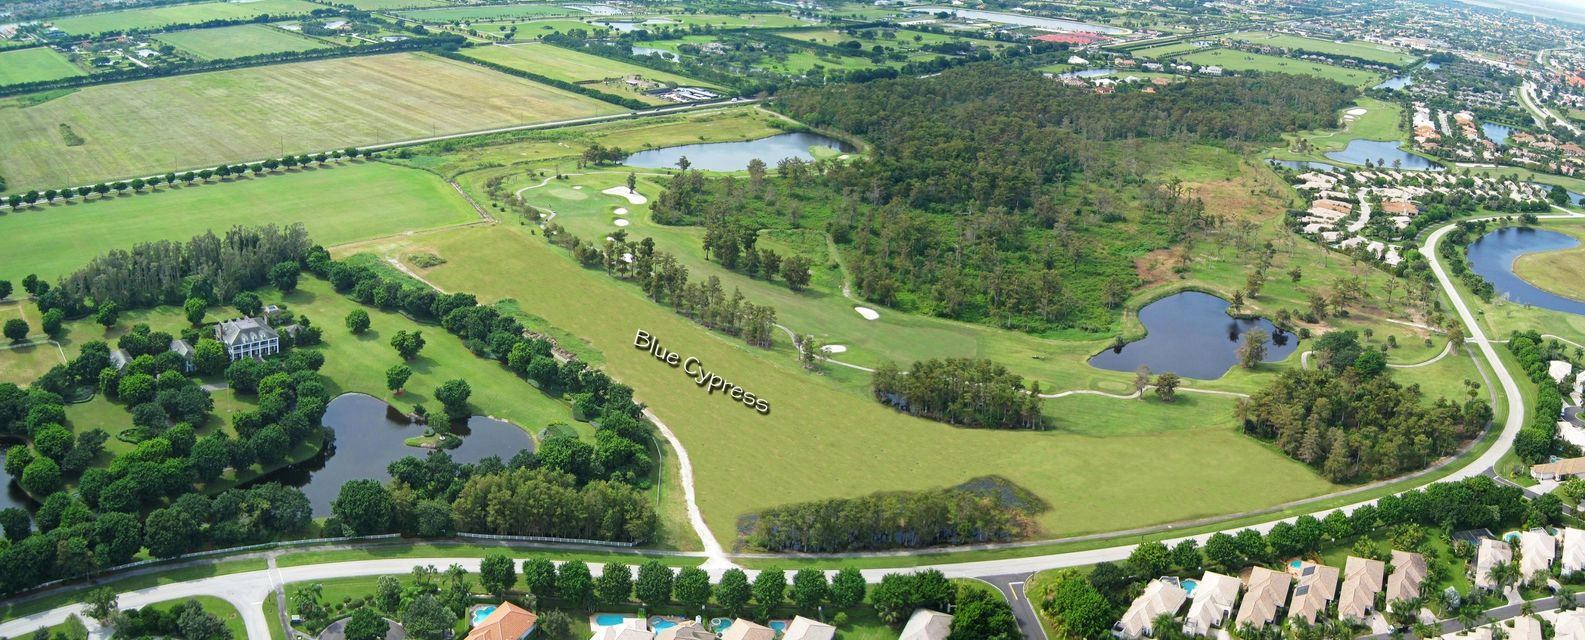 Single Family Home for Sale at 3221 Blue Cypress Lane 3221 Blue Cypress Lane Wellington, Florida 33414 United States